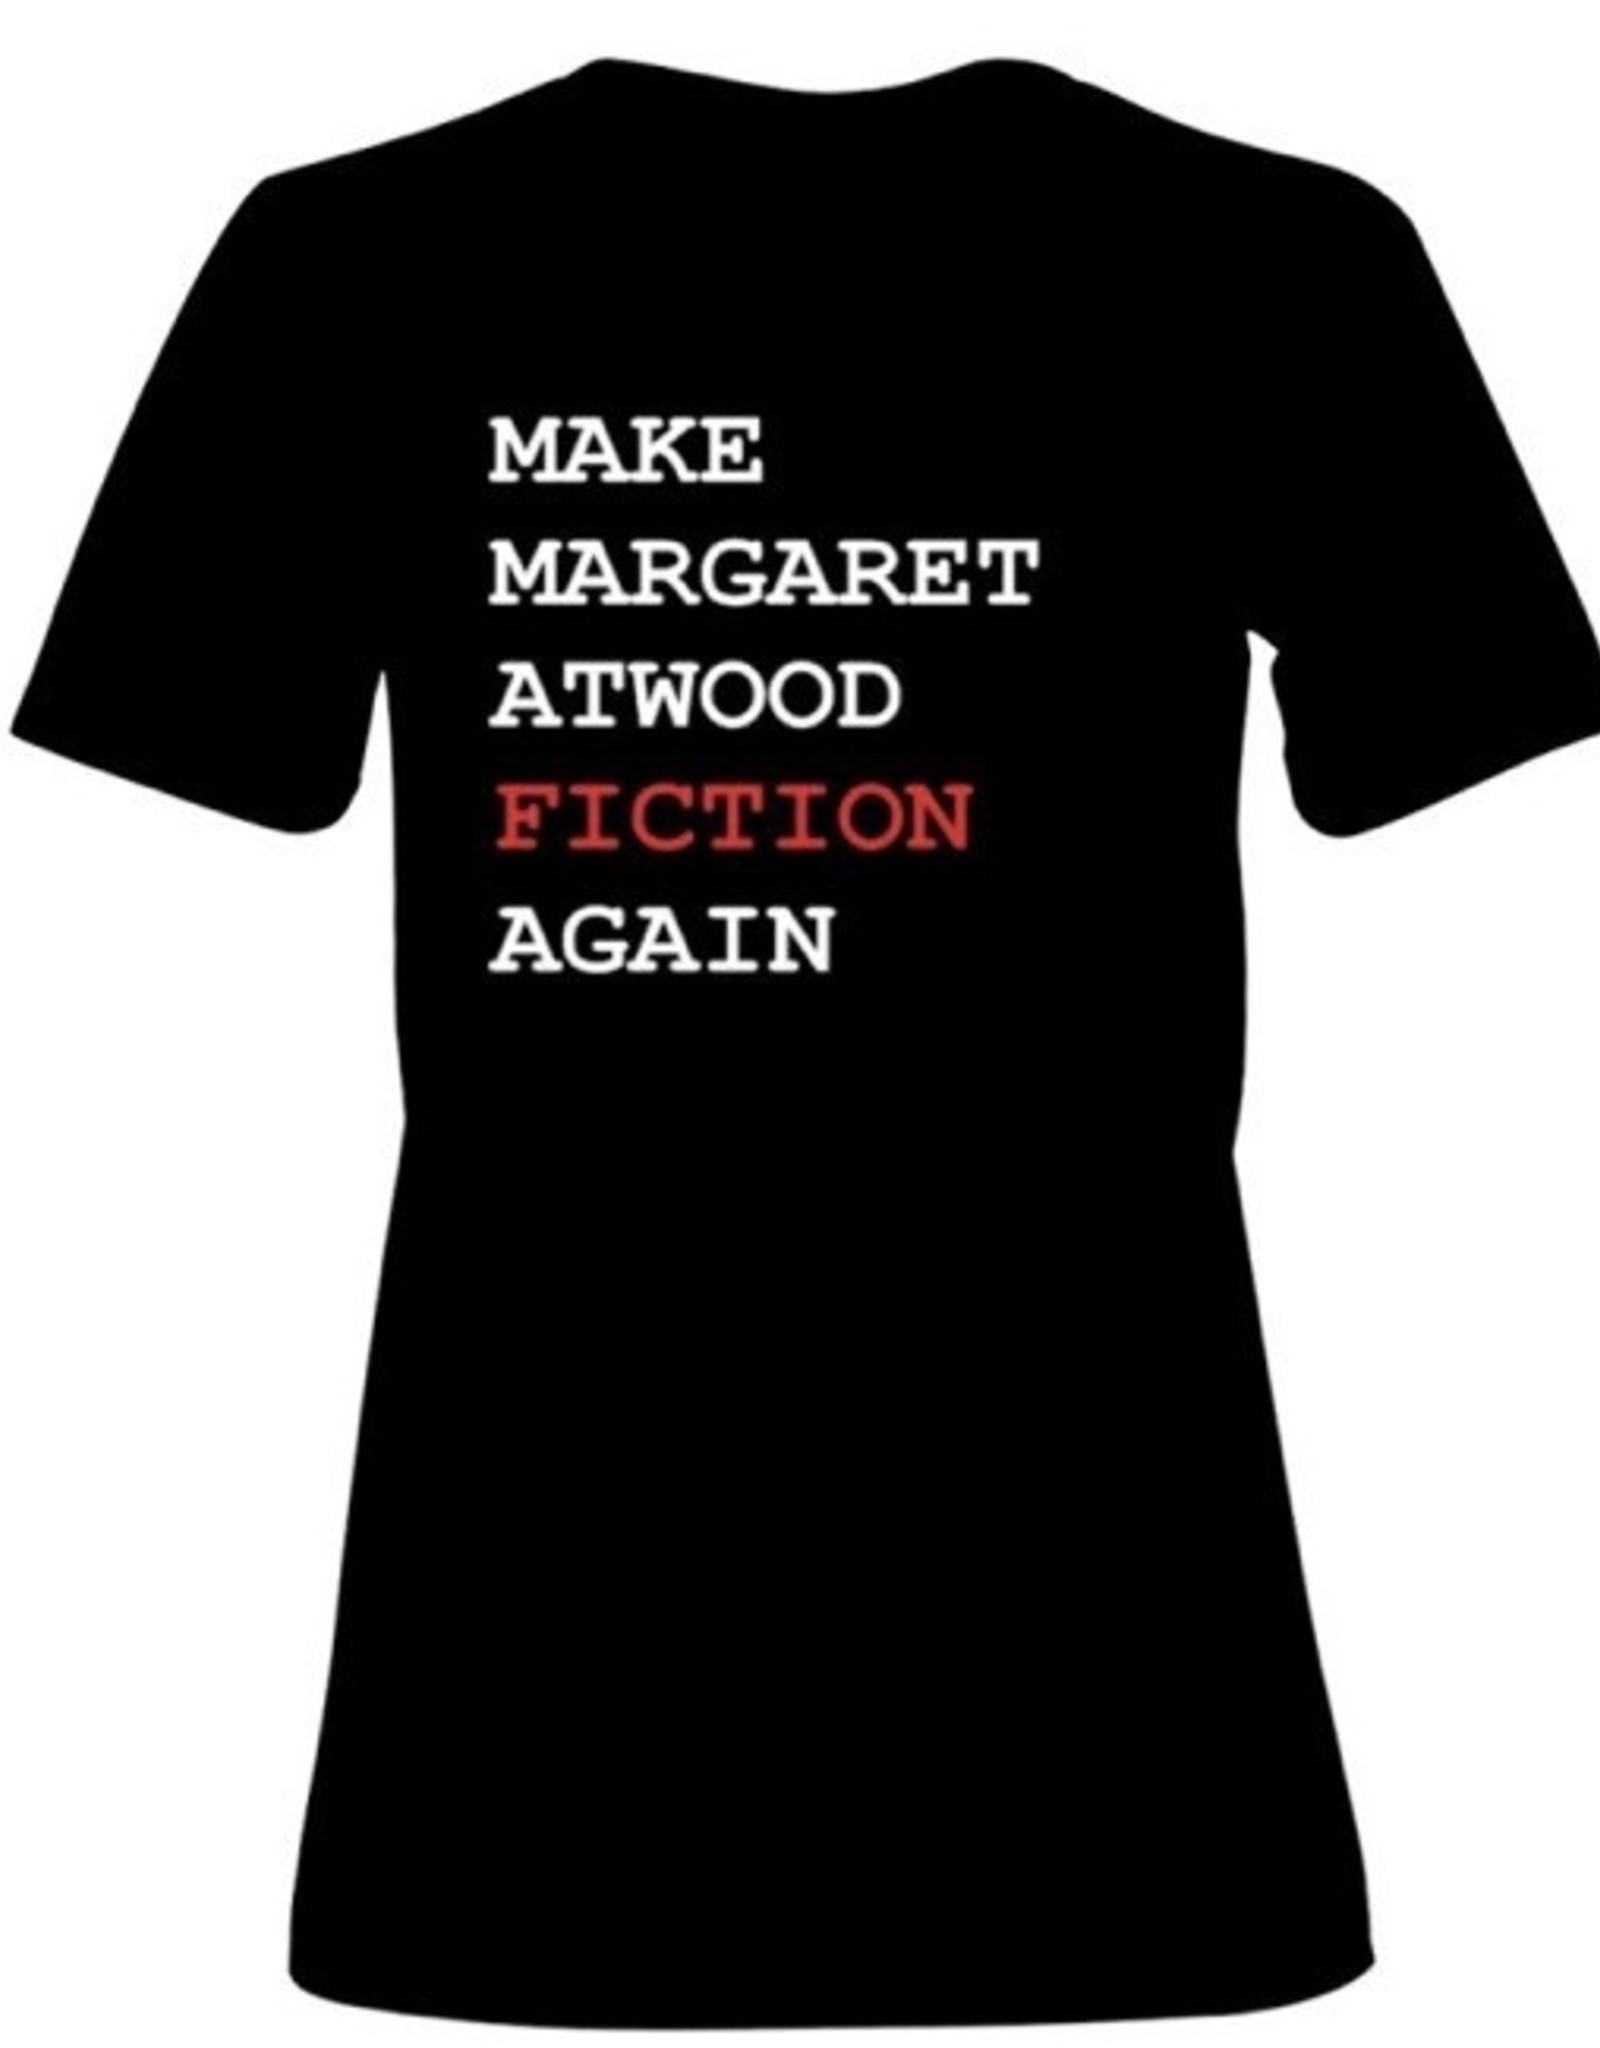 T-Shirt - Make Margaret Atwood Fiction Again